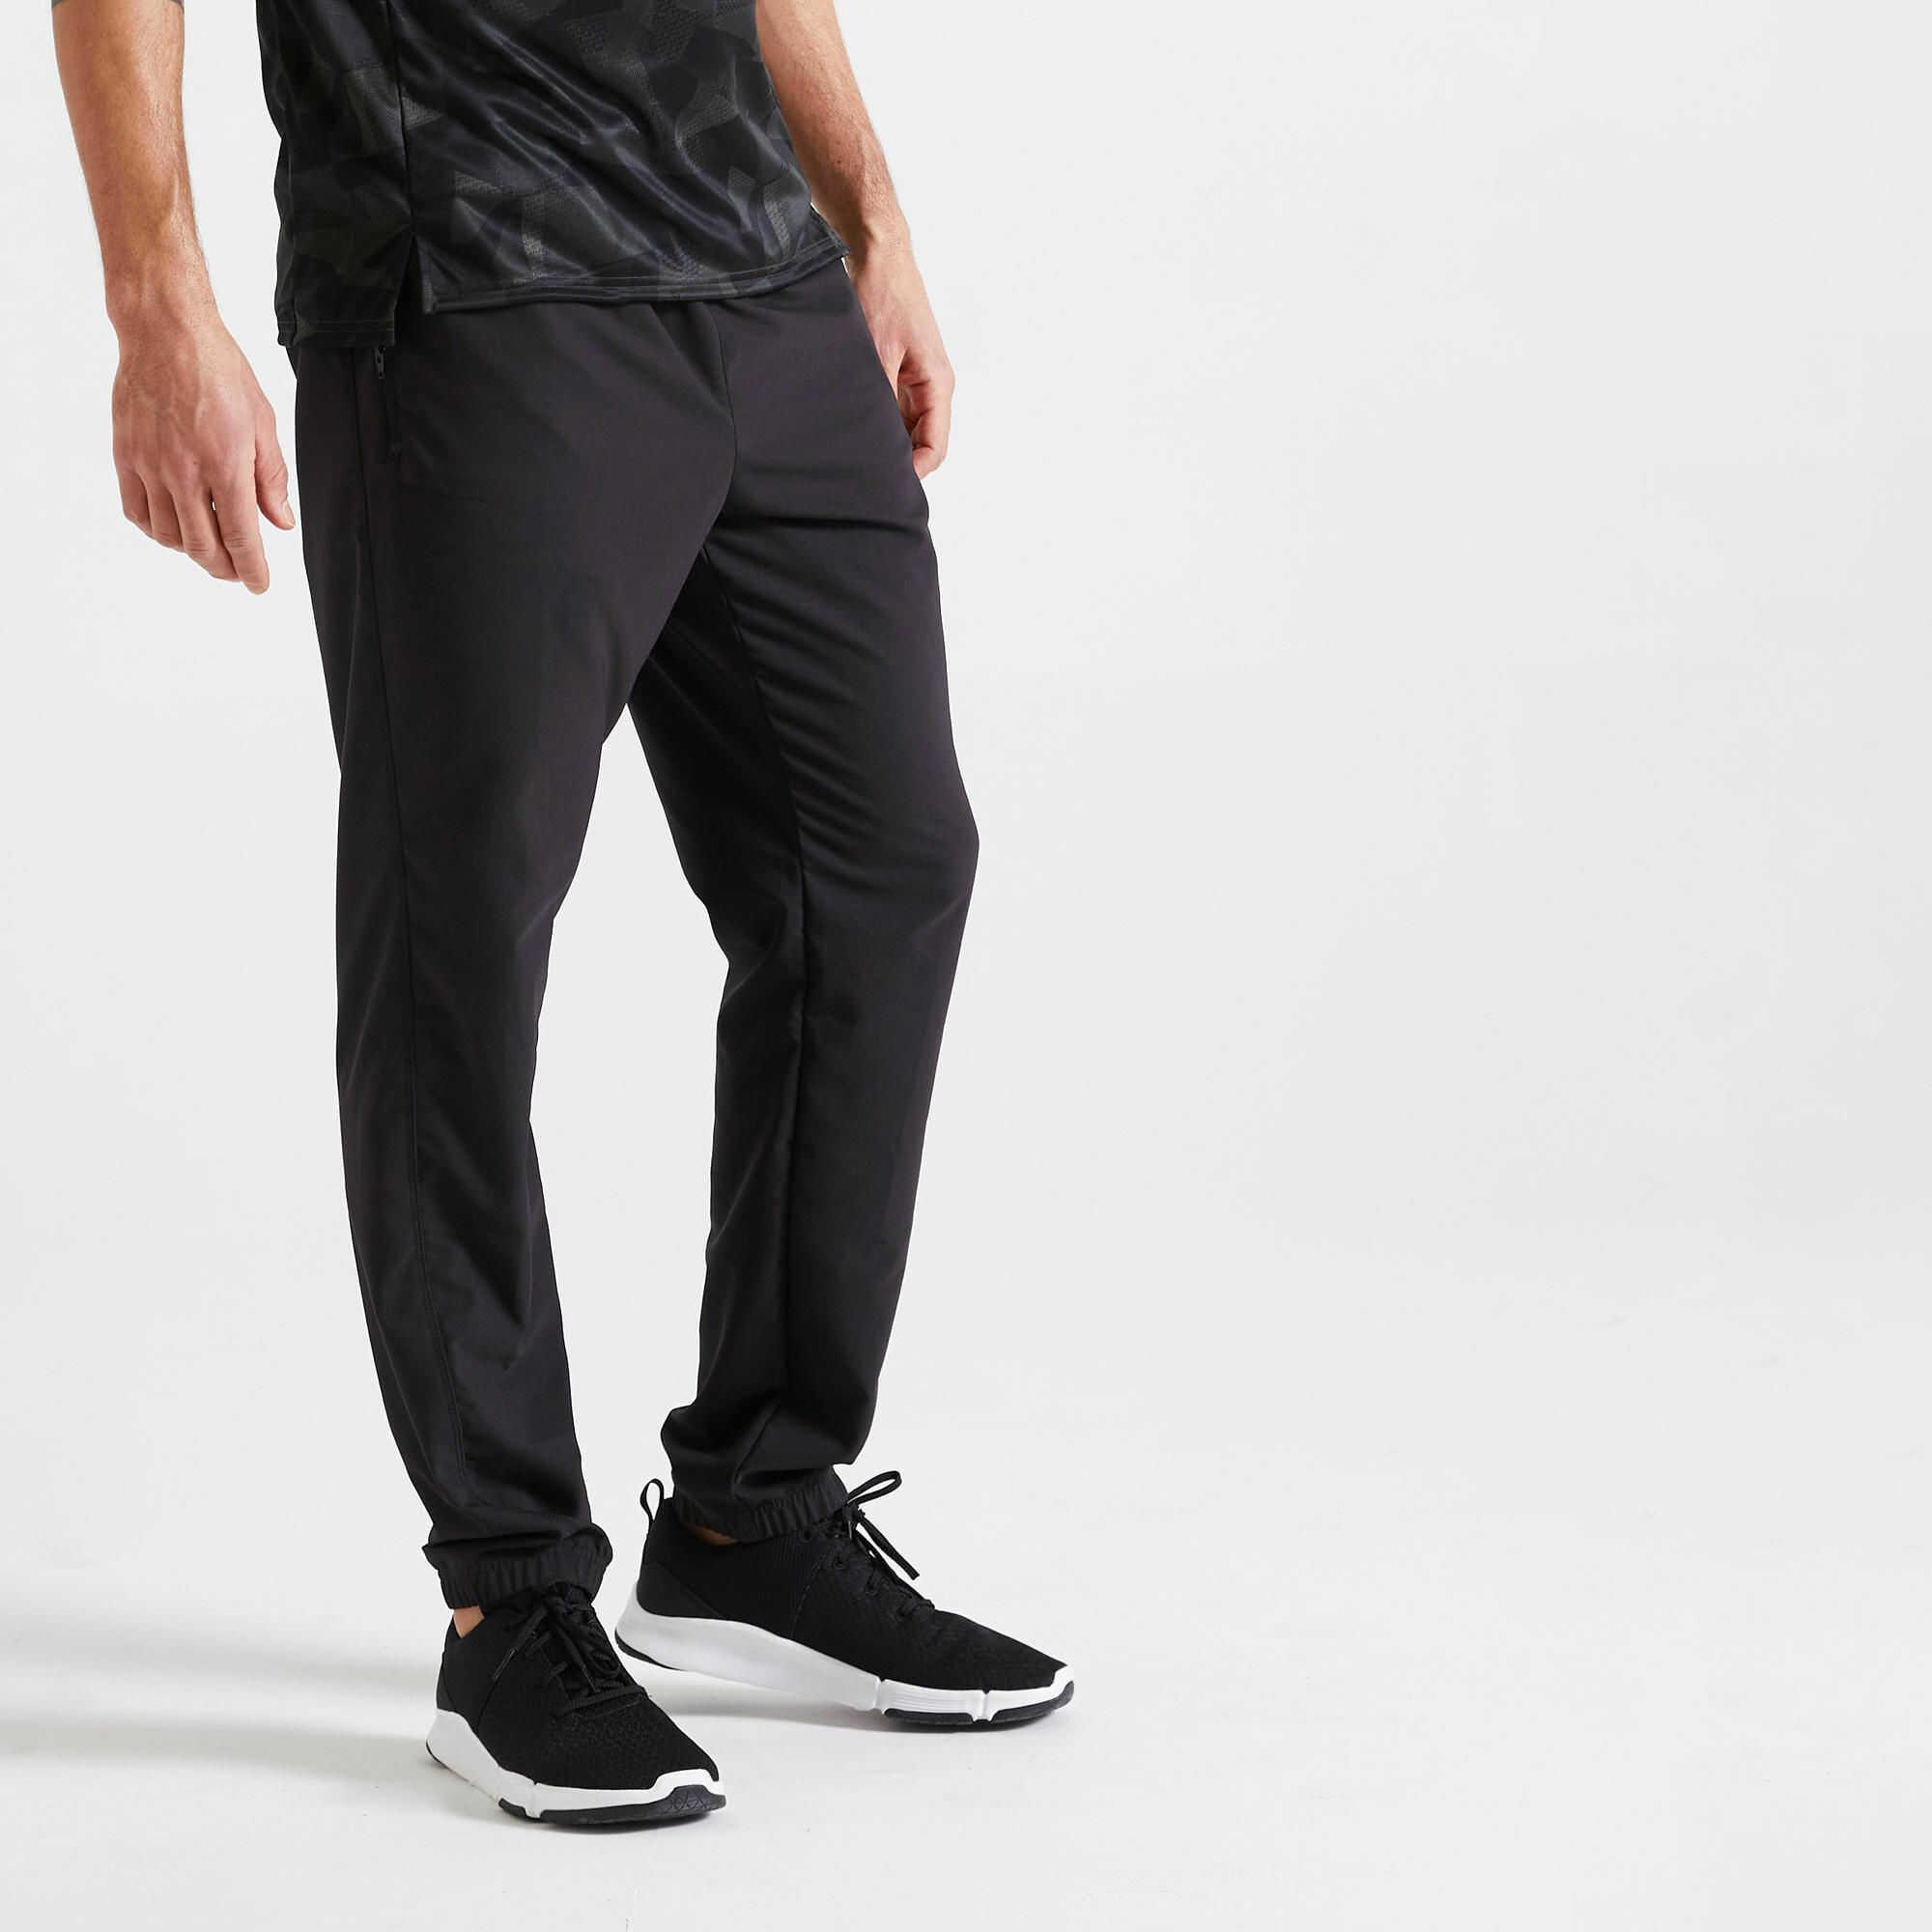 Spodnie fitness męskie Domyos 120